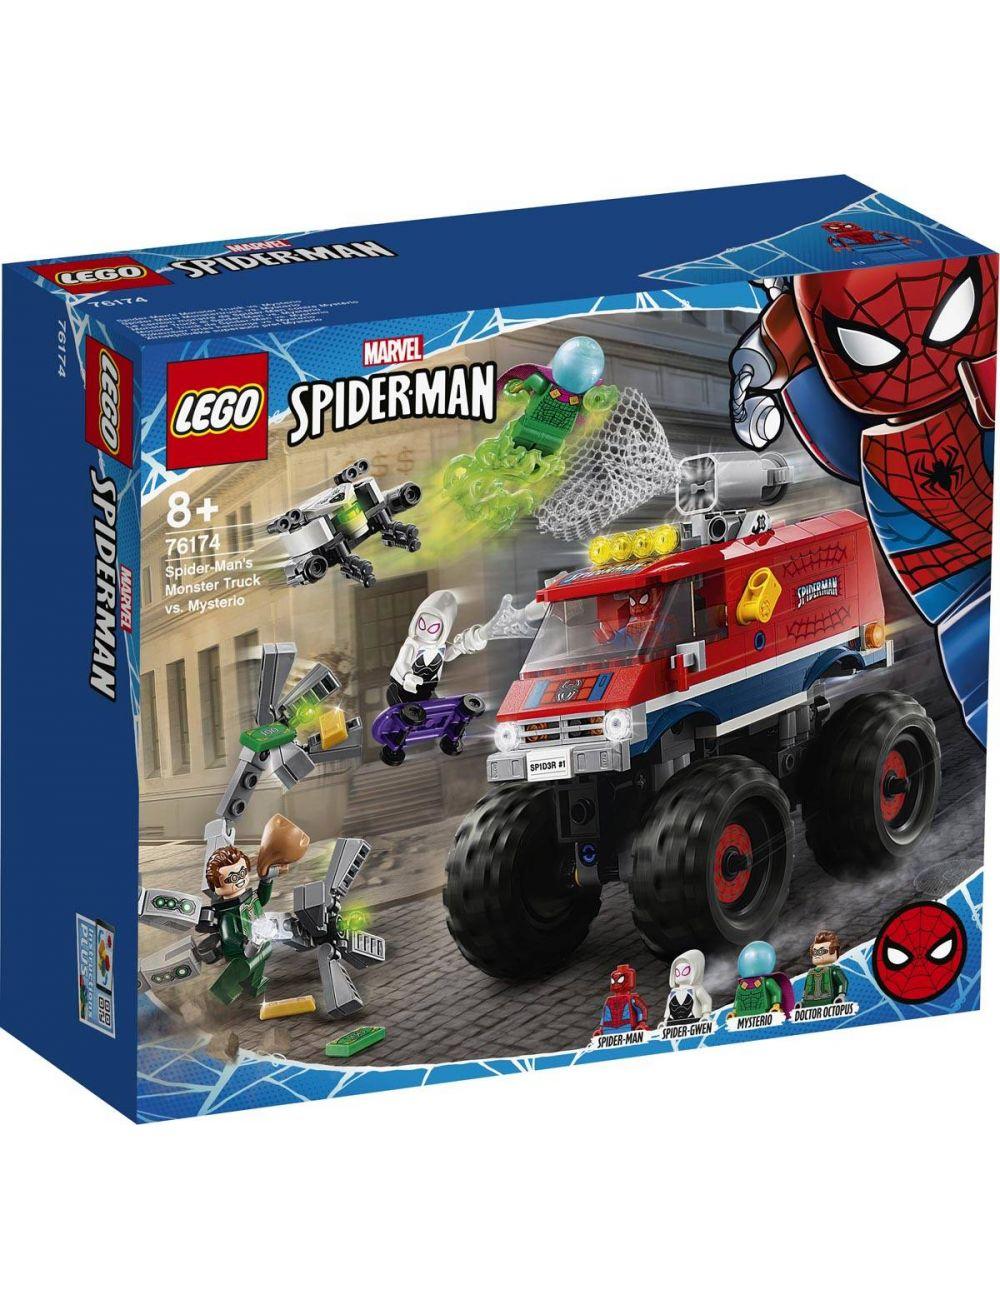 LEGO Spiderman Monster truck Spider-Mana kontra Mysterio 76174